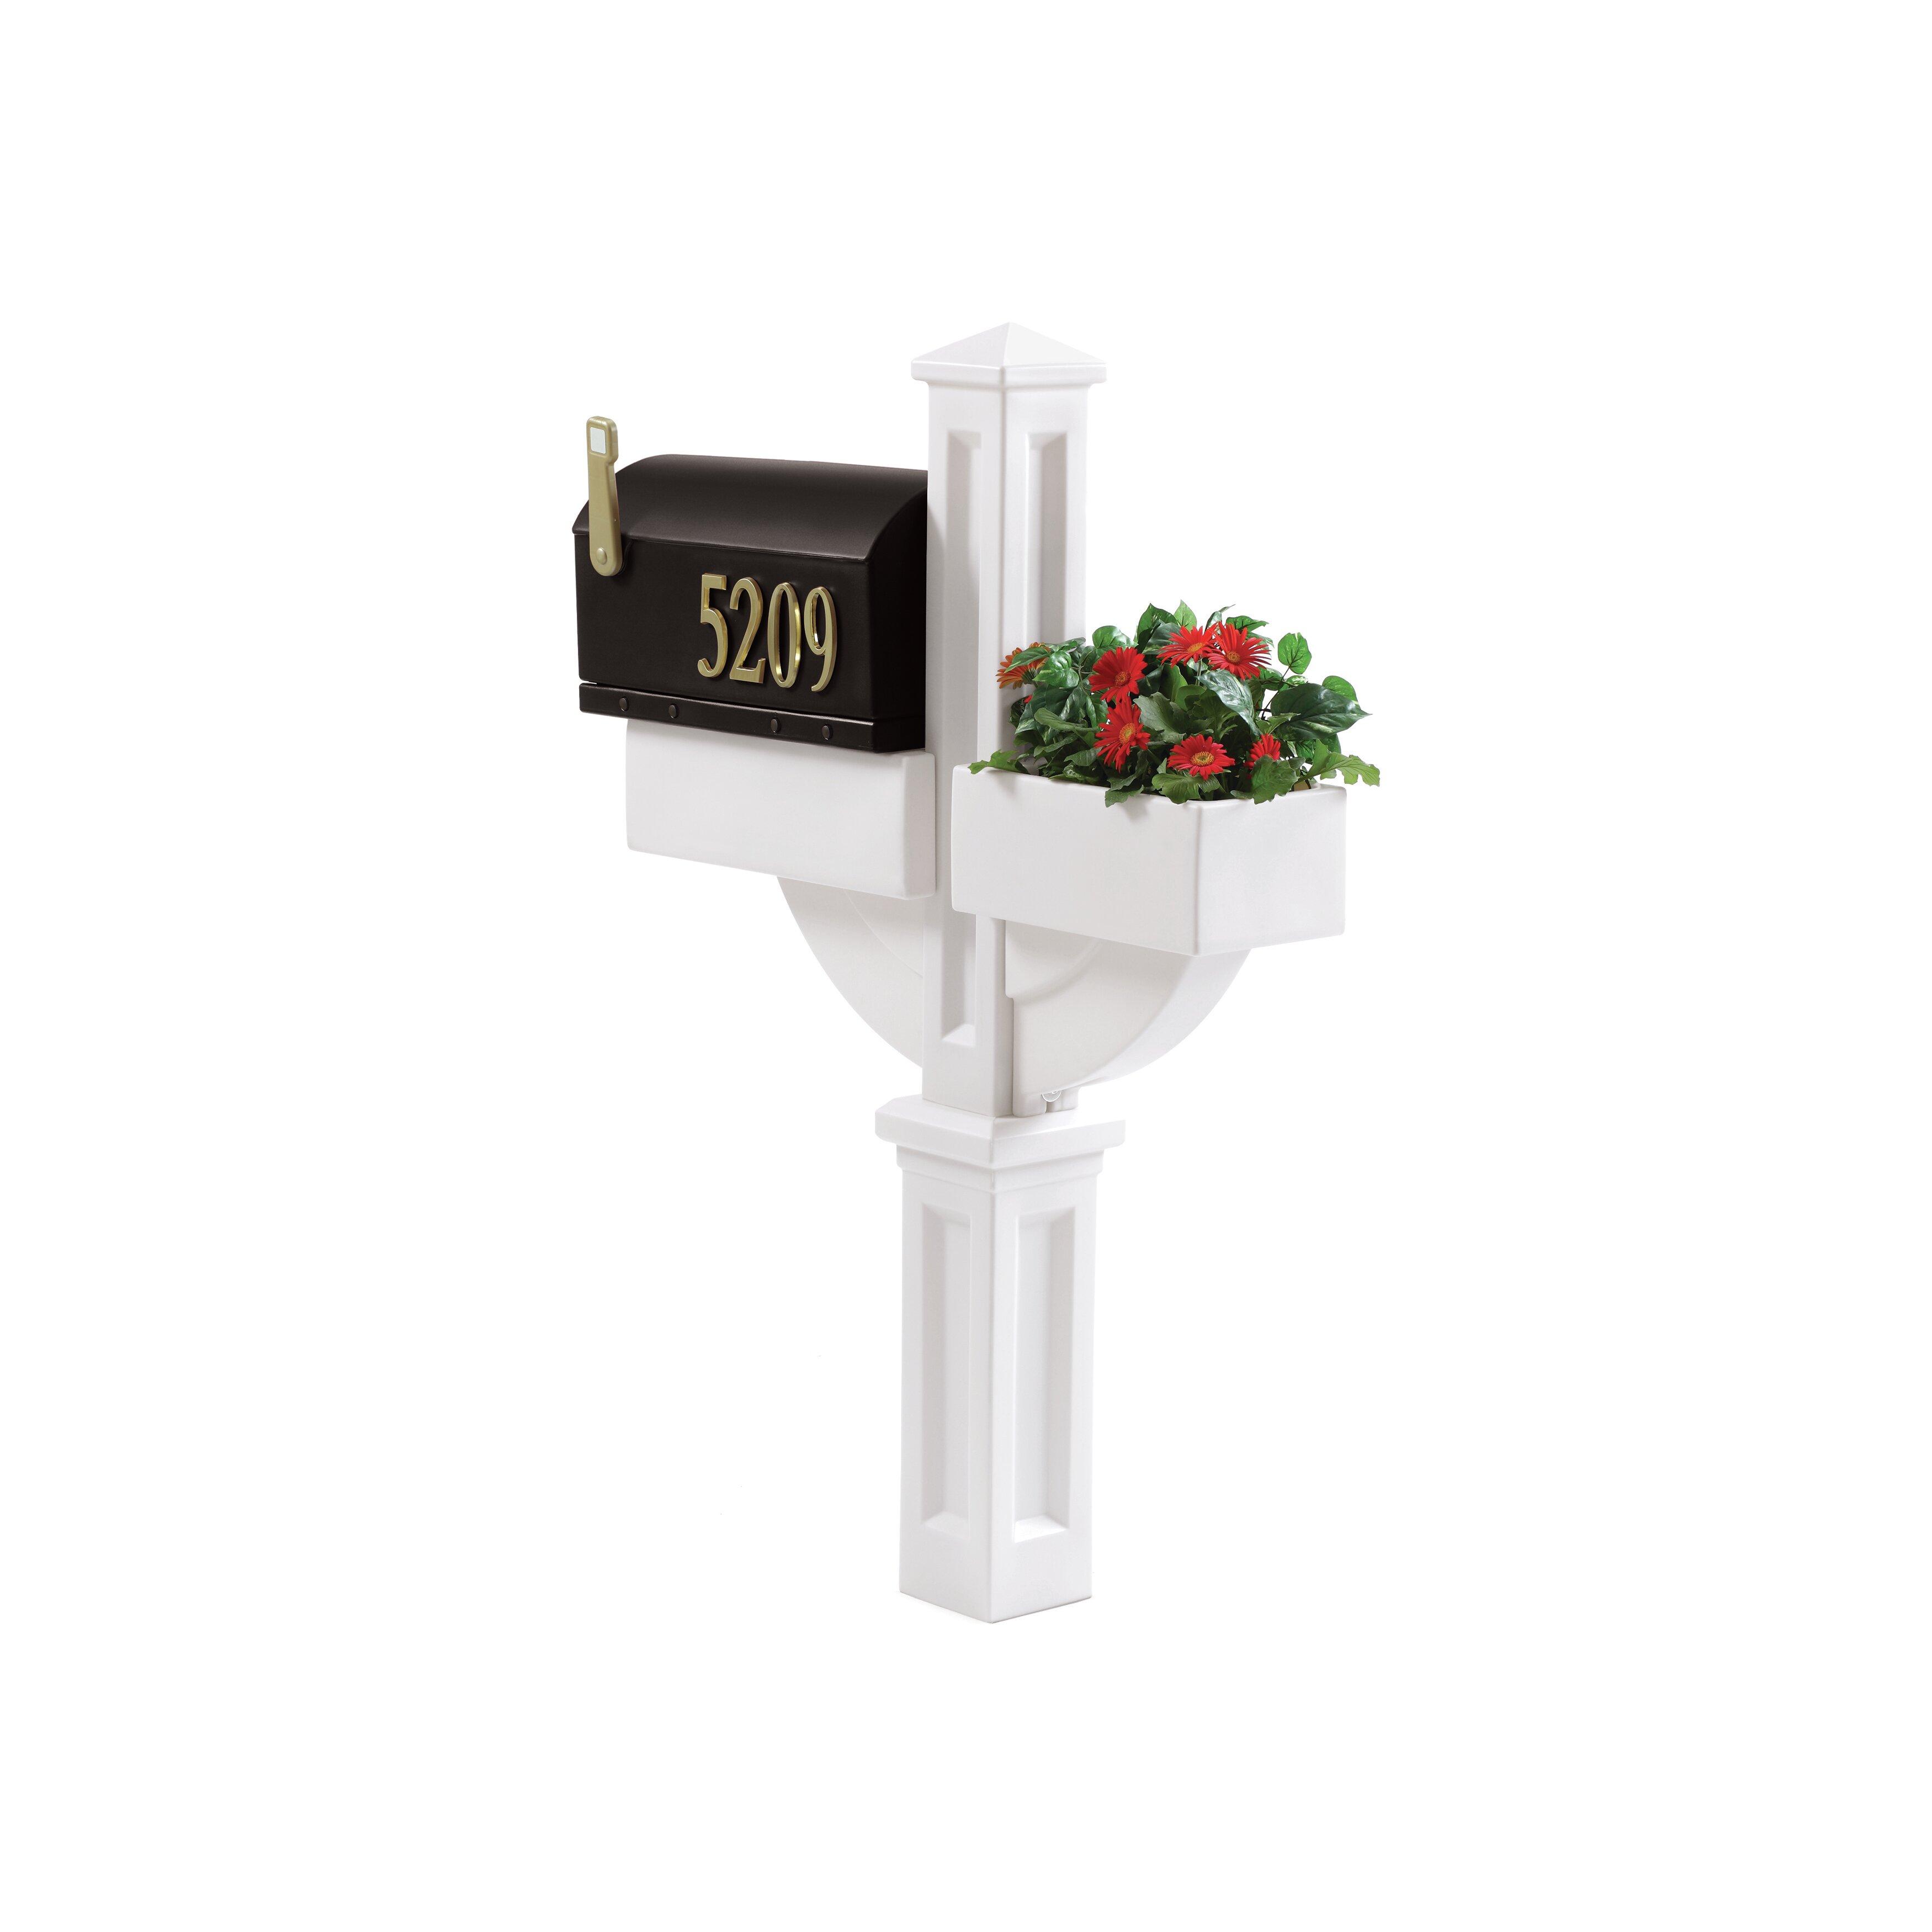 Step2 Mailmaster Hudson With Planter Post Mounted Mailbox Reviews Wayfair